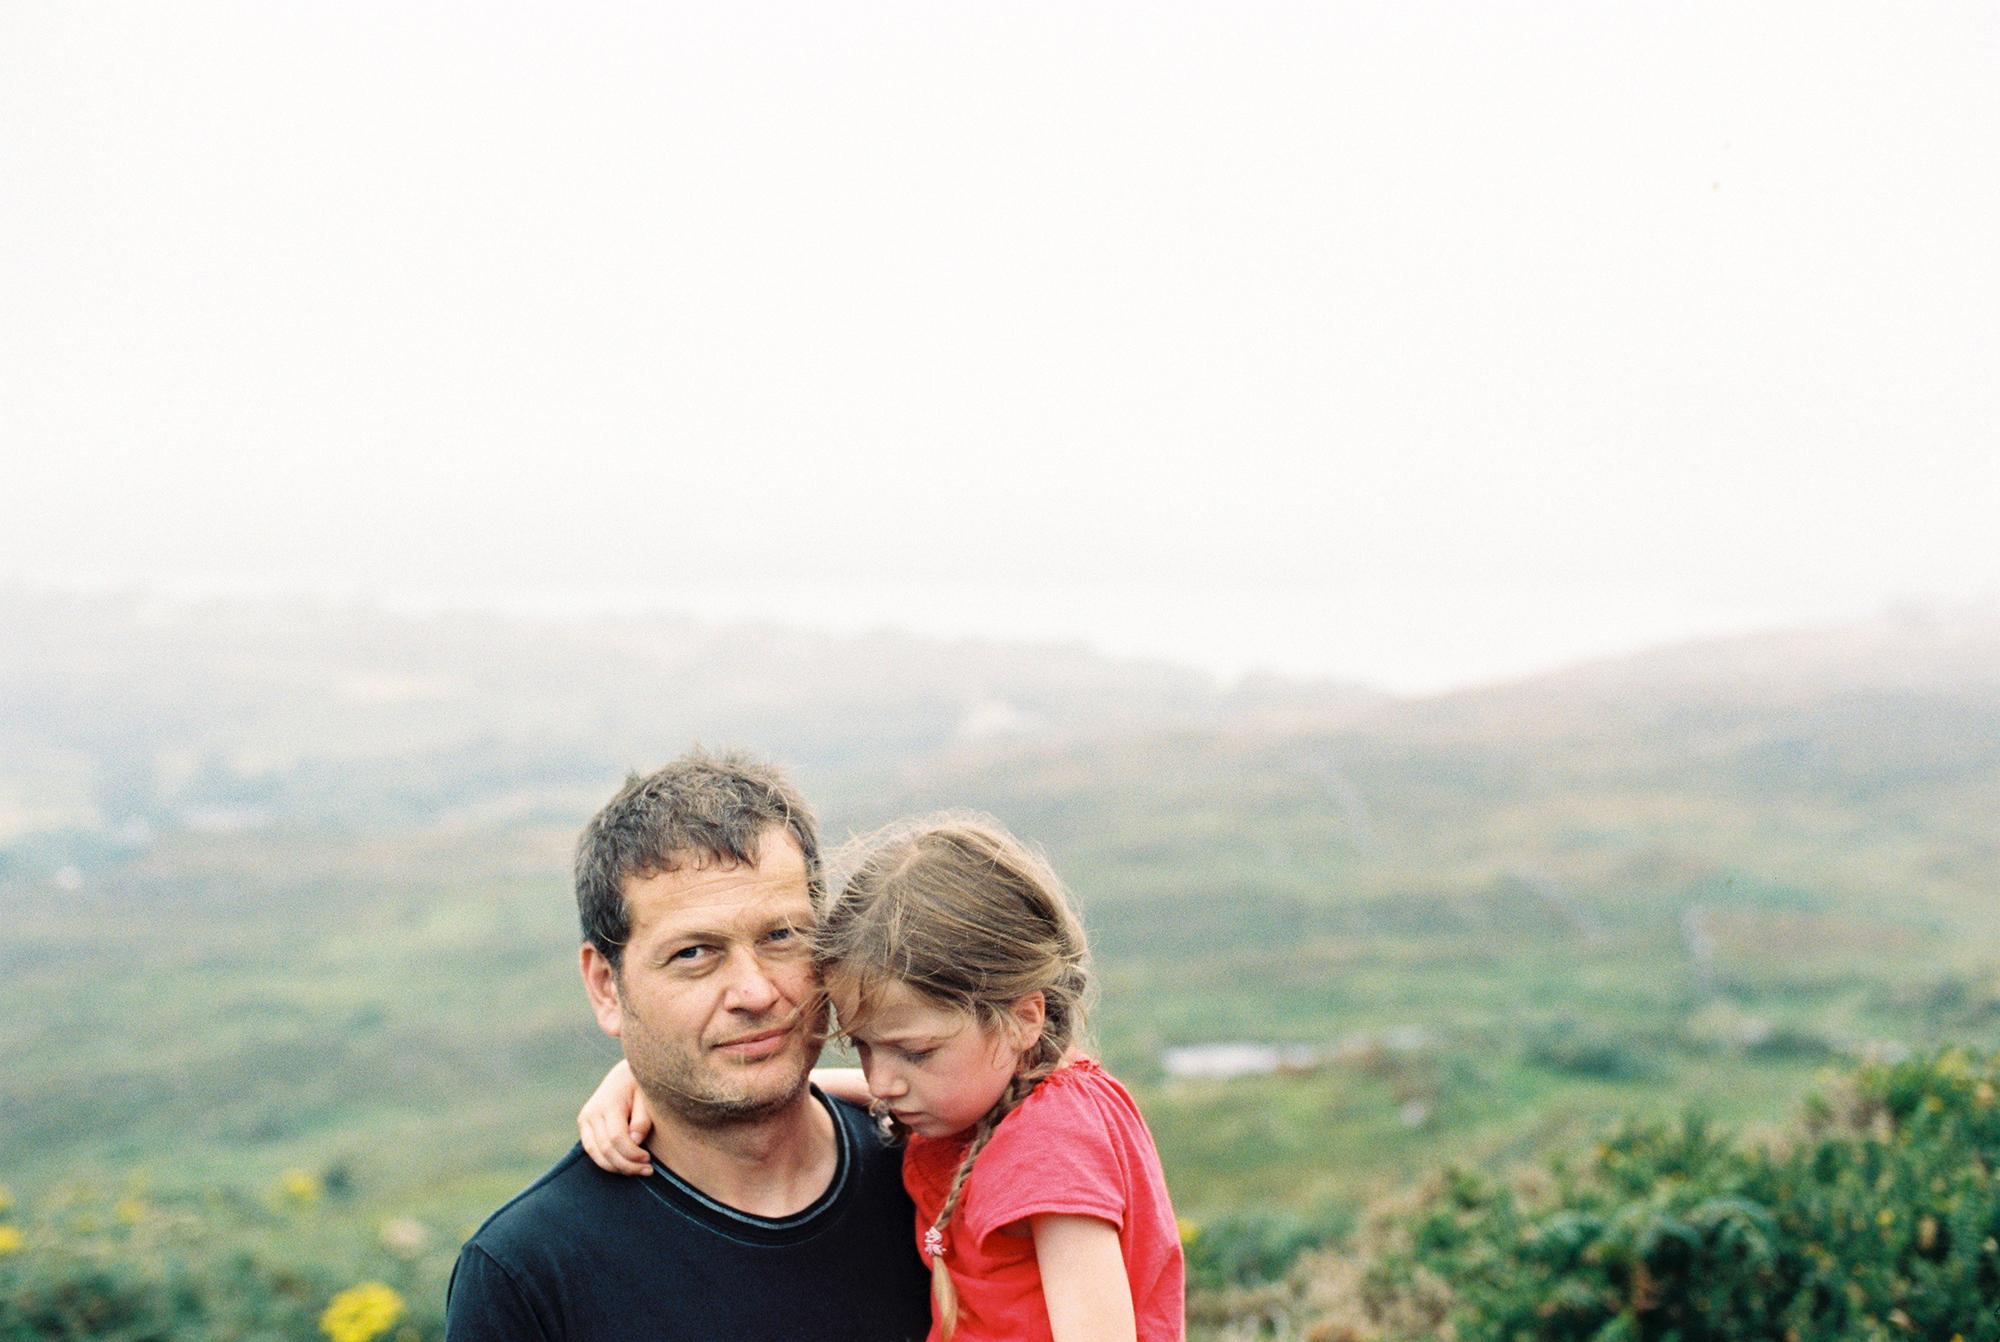 cumbria_family_photographer (27).jpg